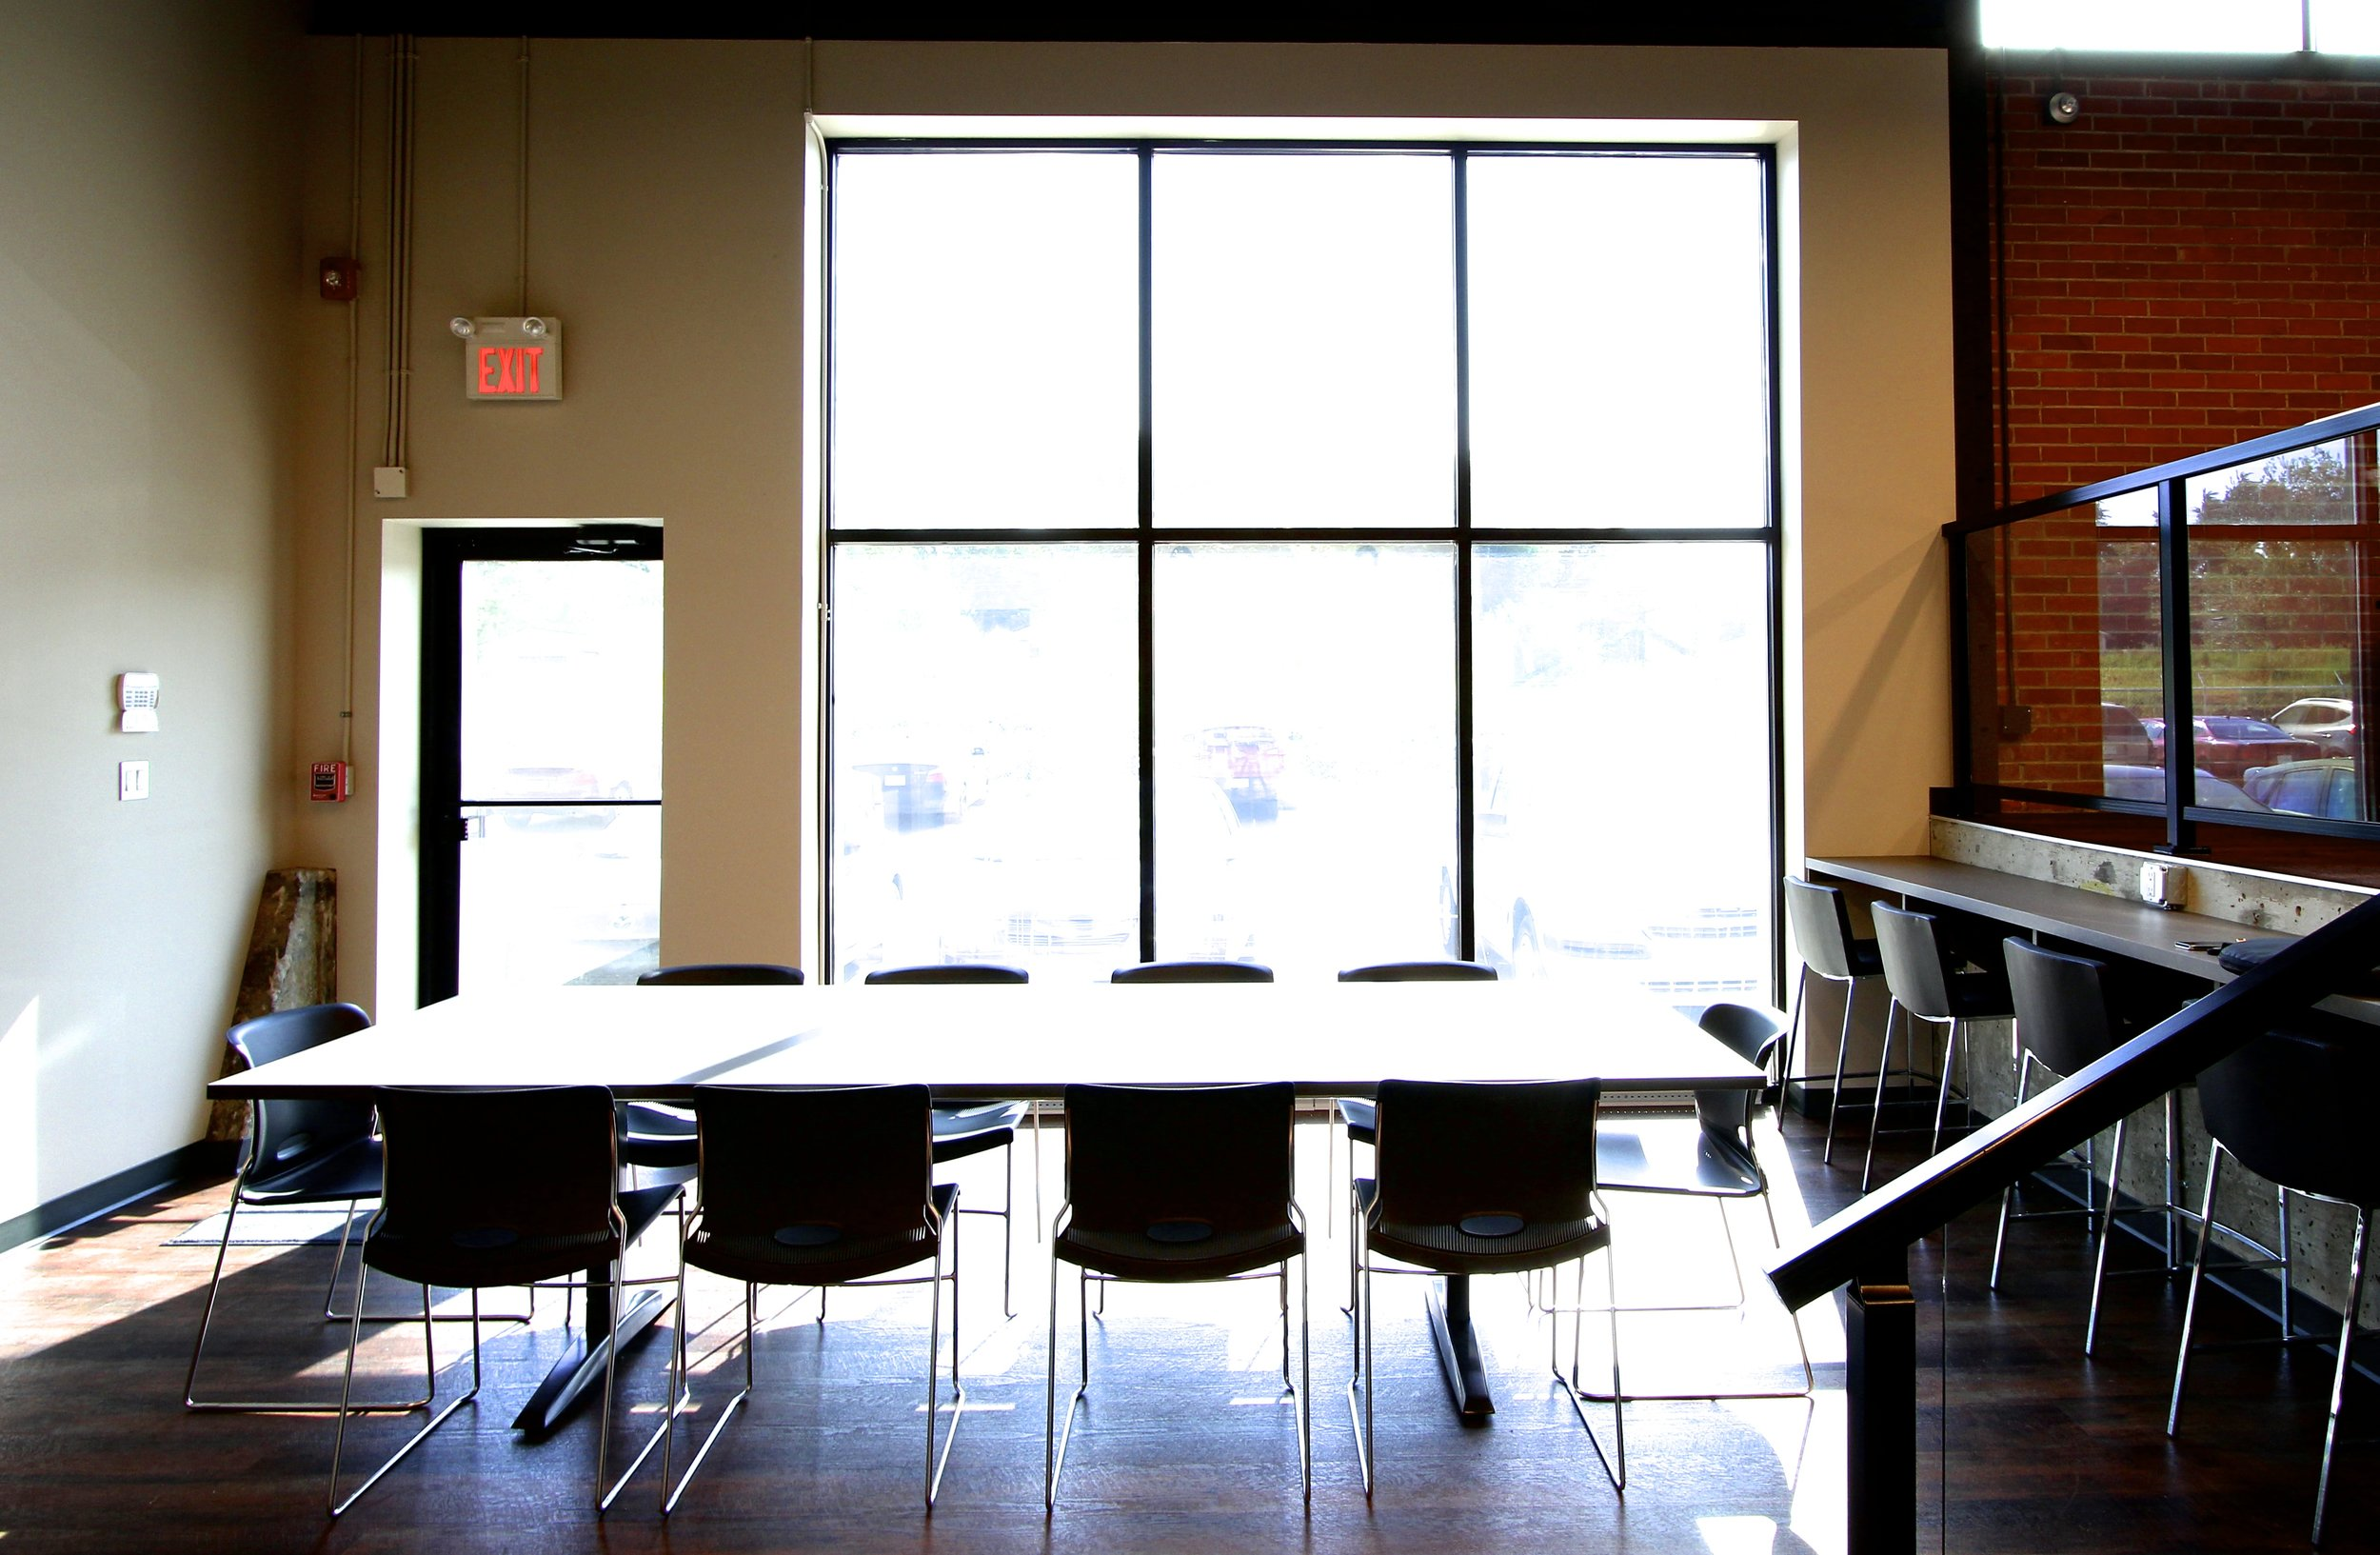 Metric Design, Interior Design, Saskatoon, Renovation, Office Lunch room, Natrual Light, Exposed Brick.jpg